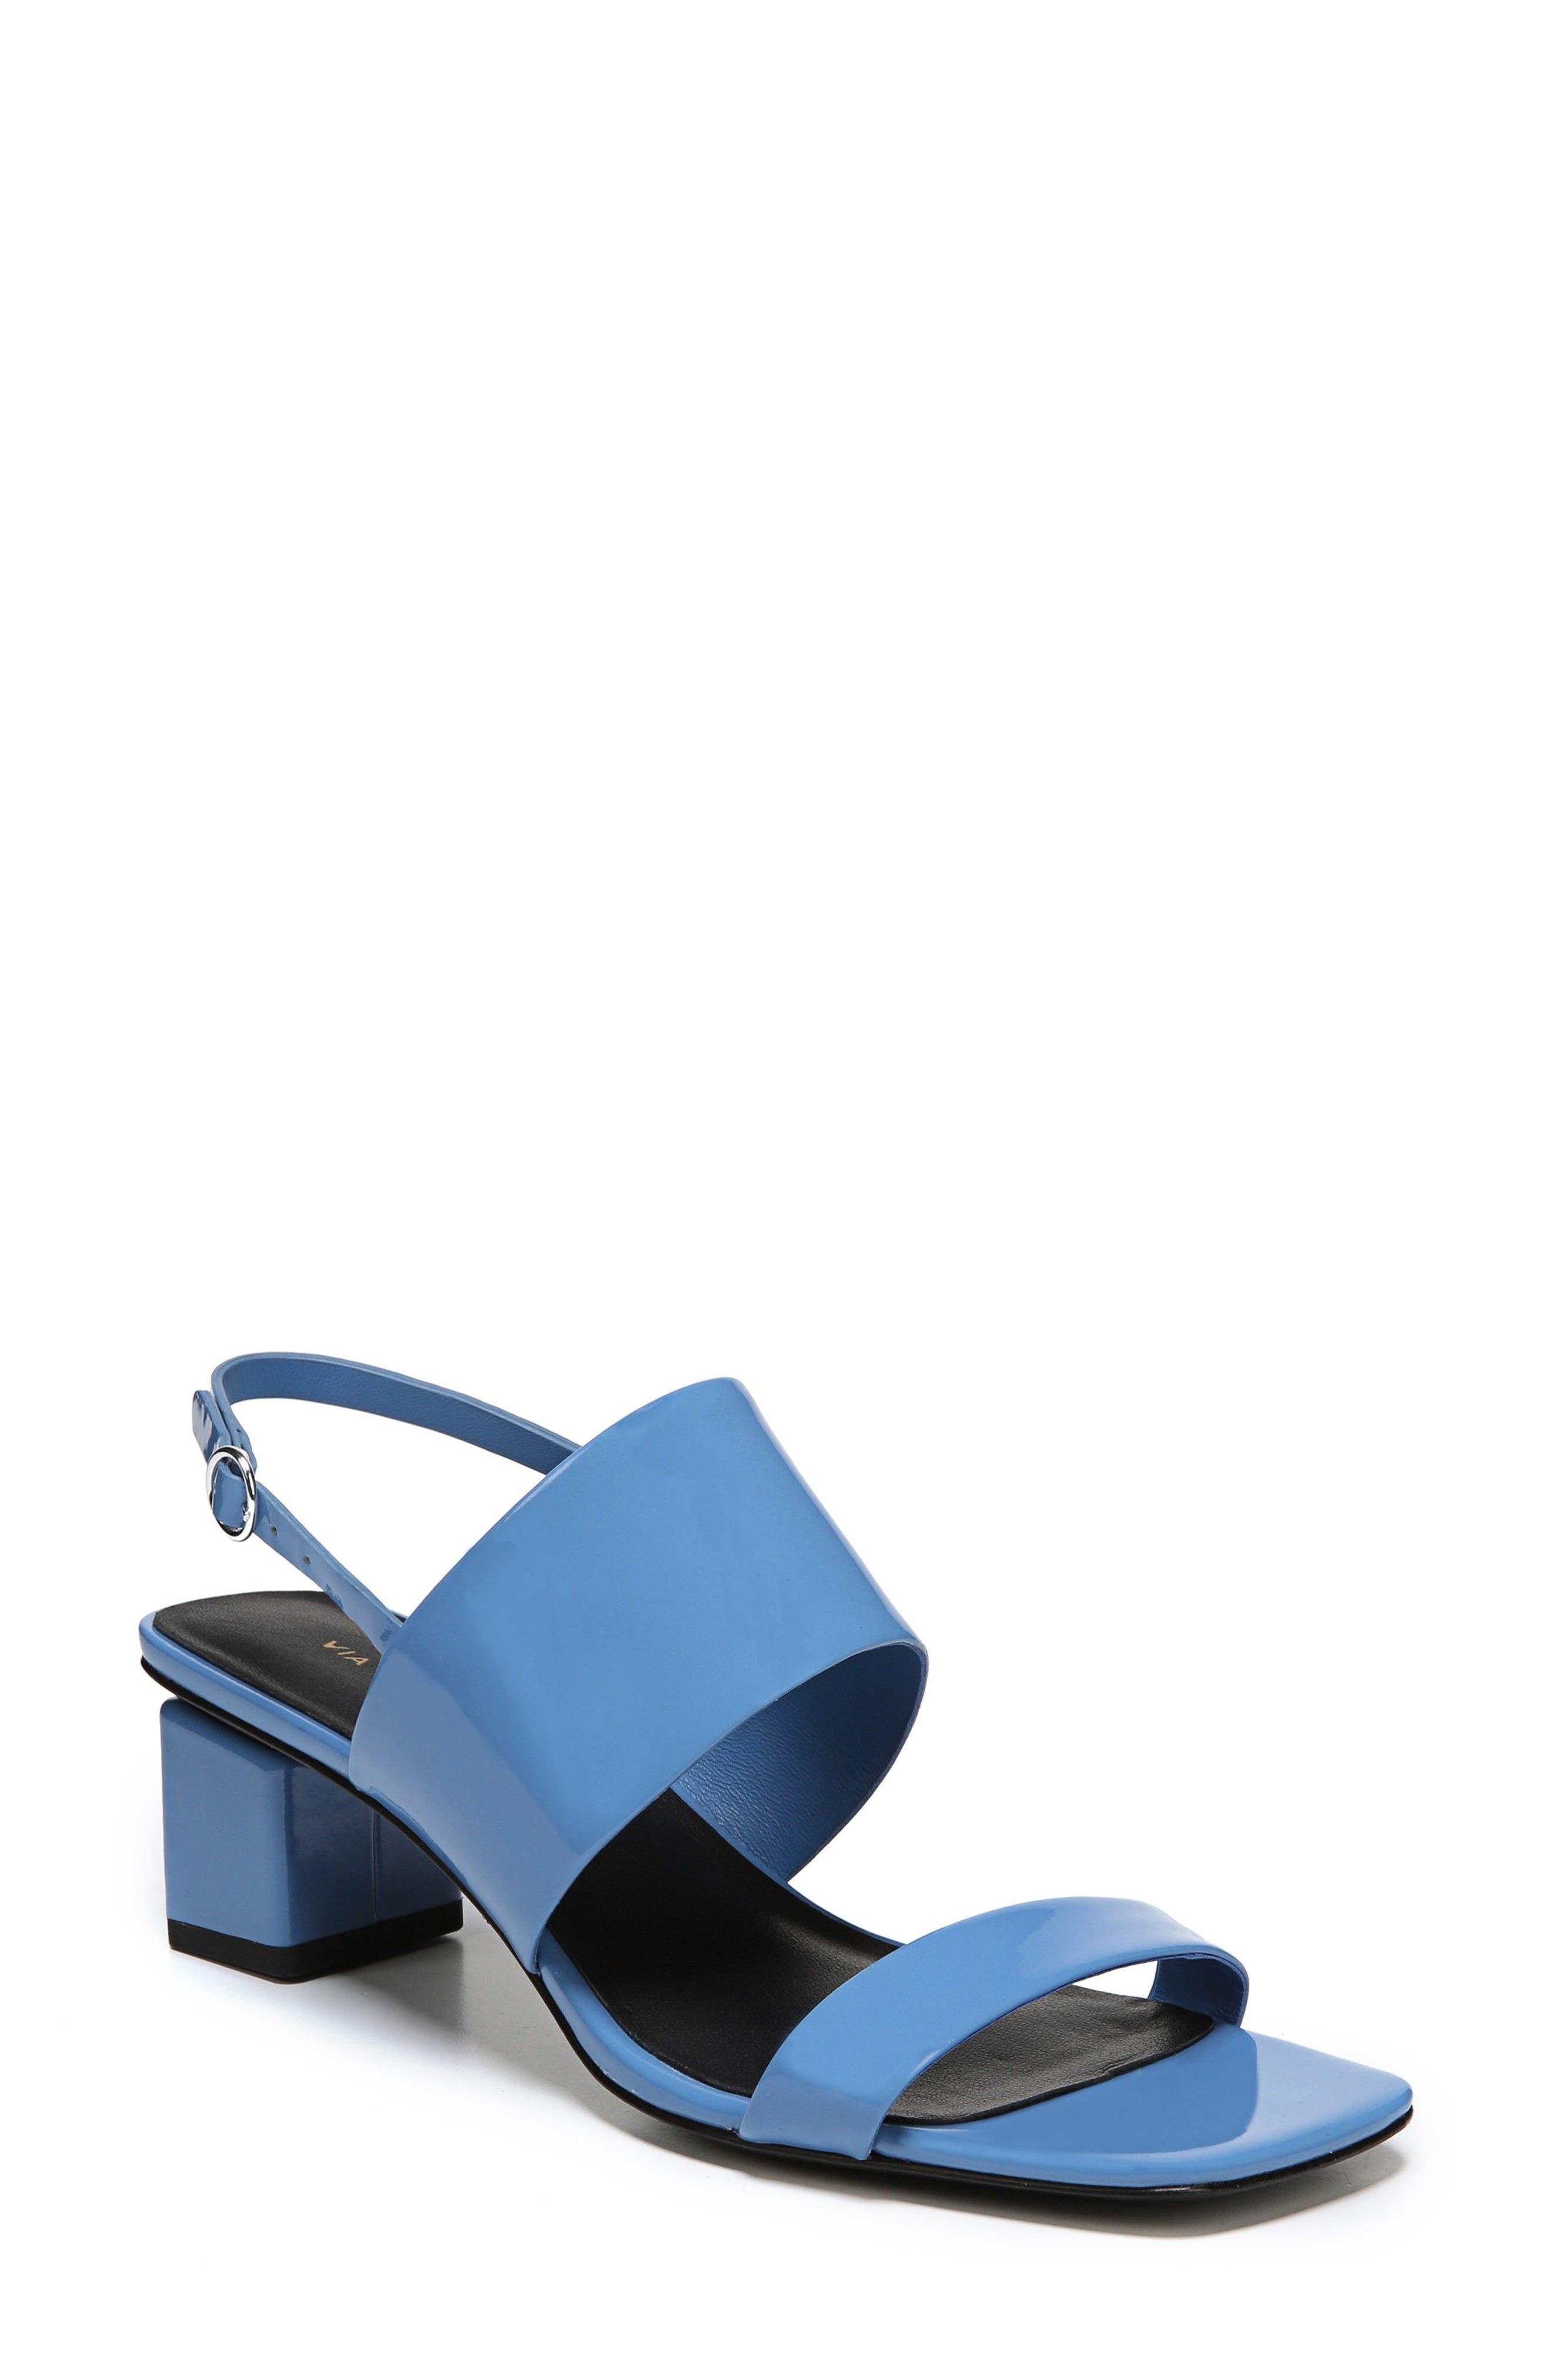 Forte Block Heel Sandal,                             Main thumbnail 7, color,